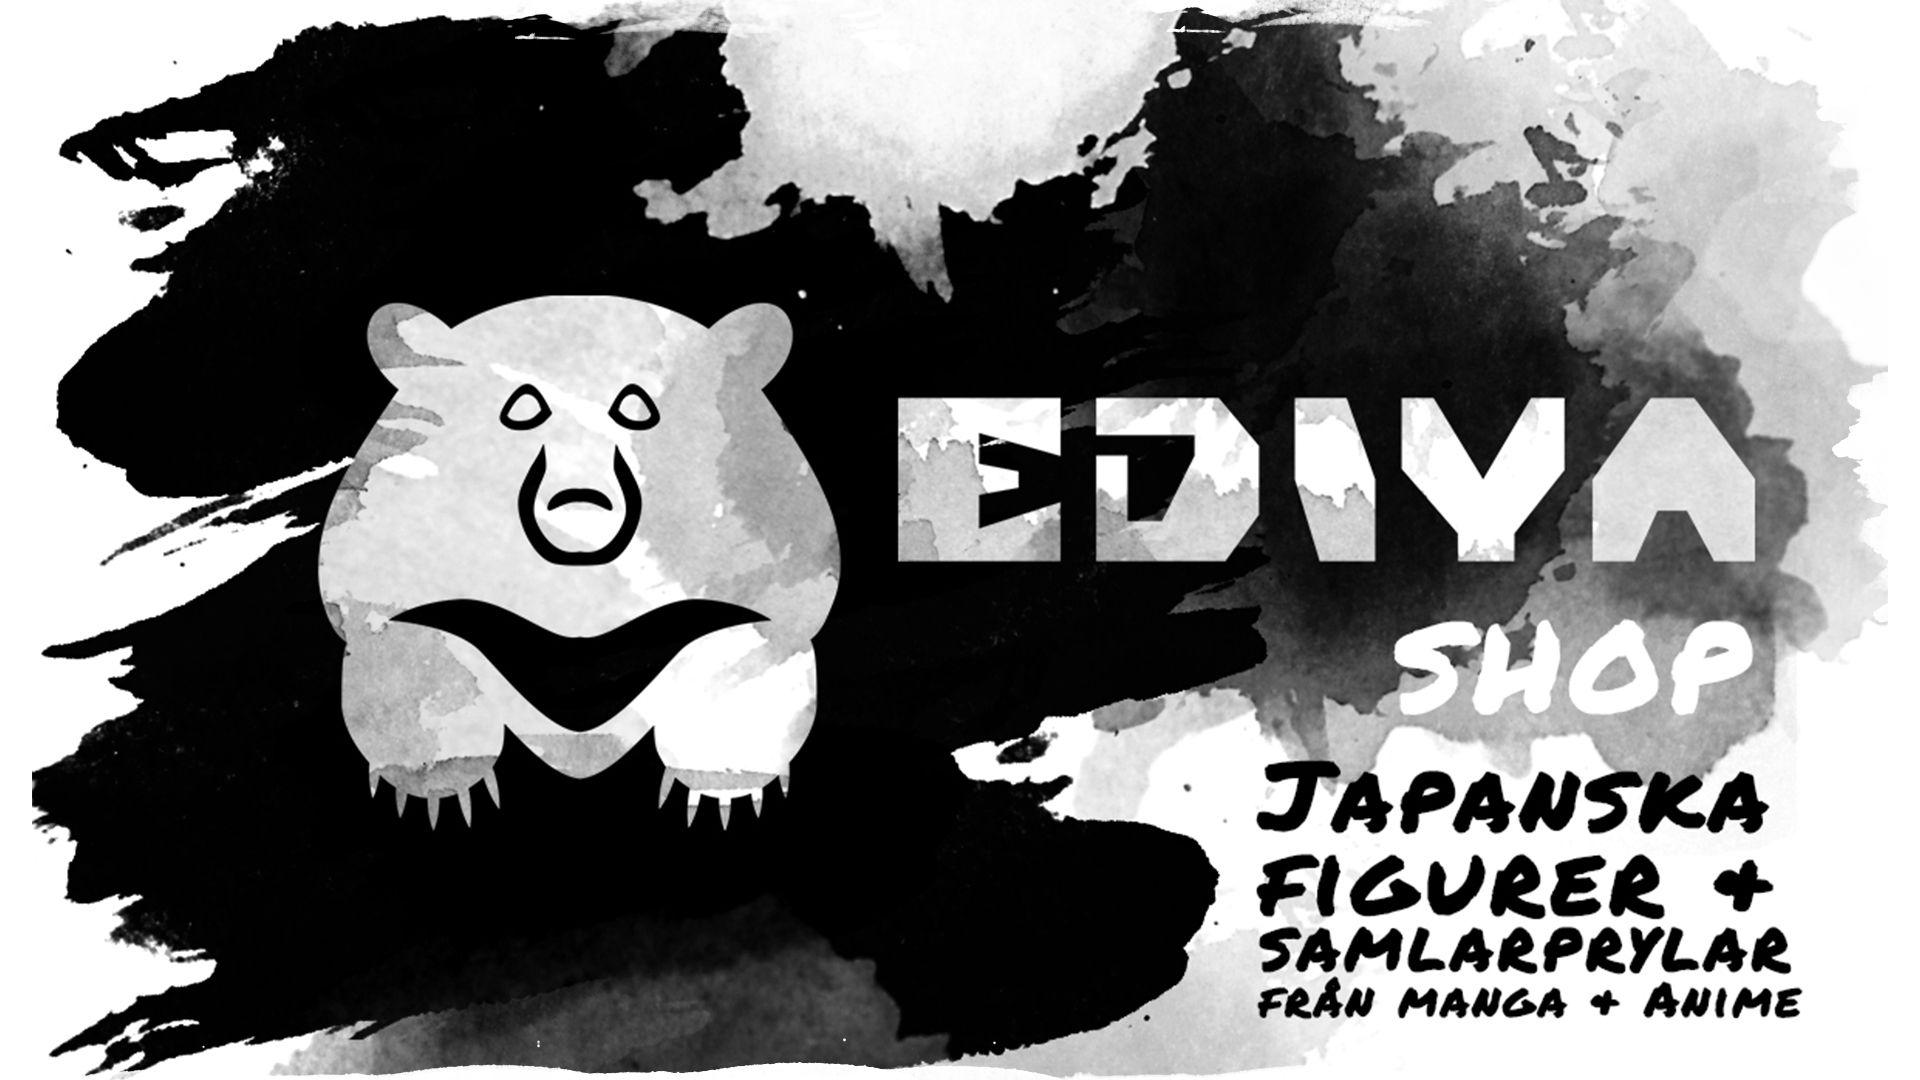 Ediya-Shop Omslagsbild